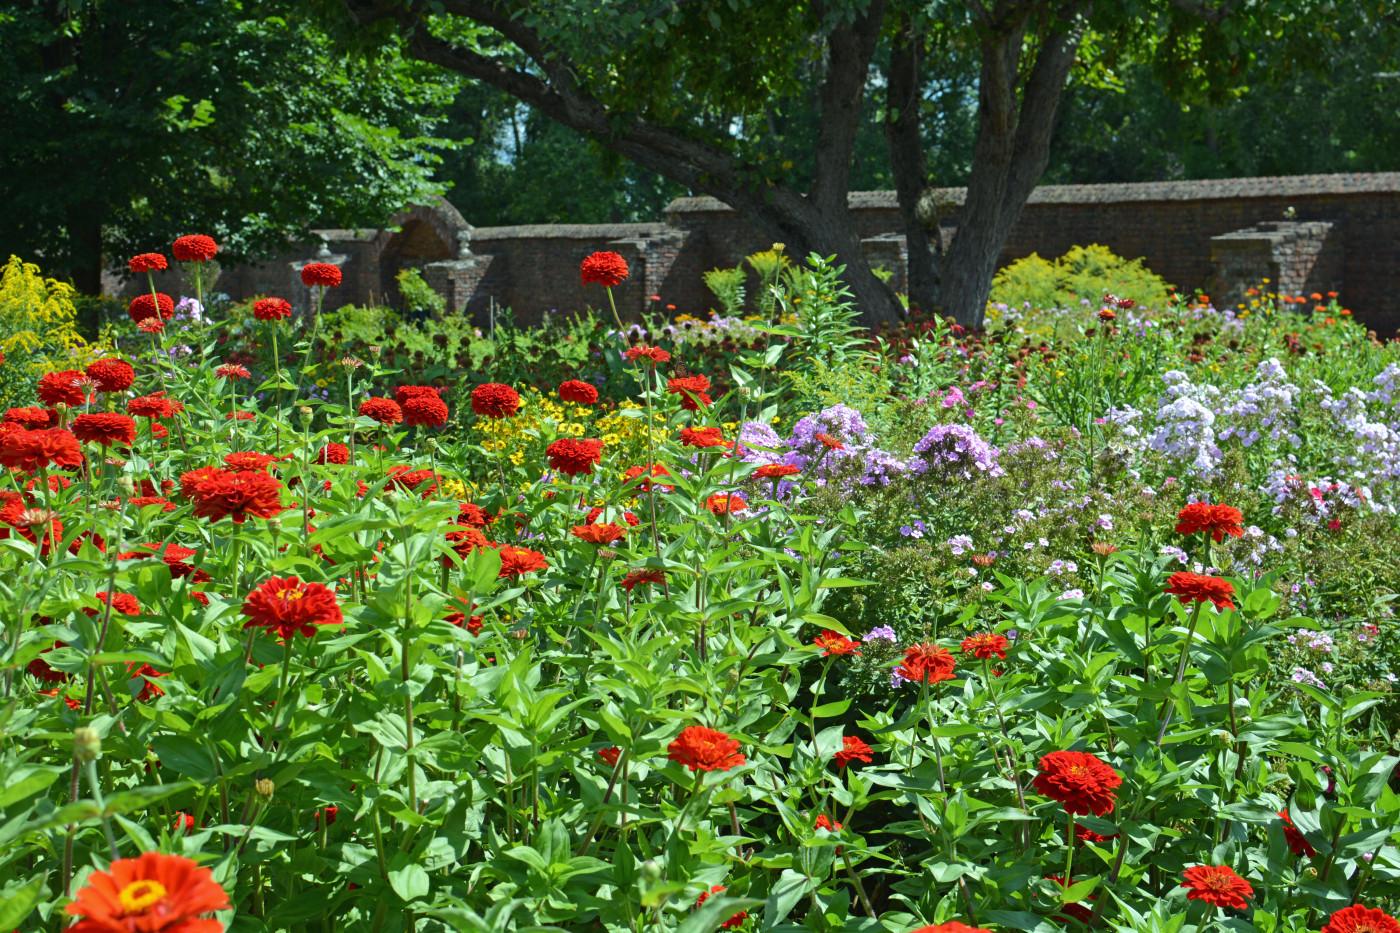 Fort Ticonderoga Annual Garden & Landscape Symposium